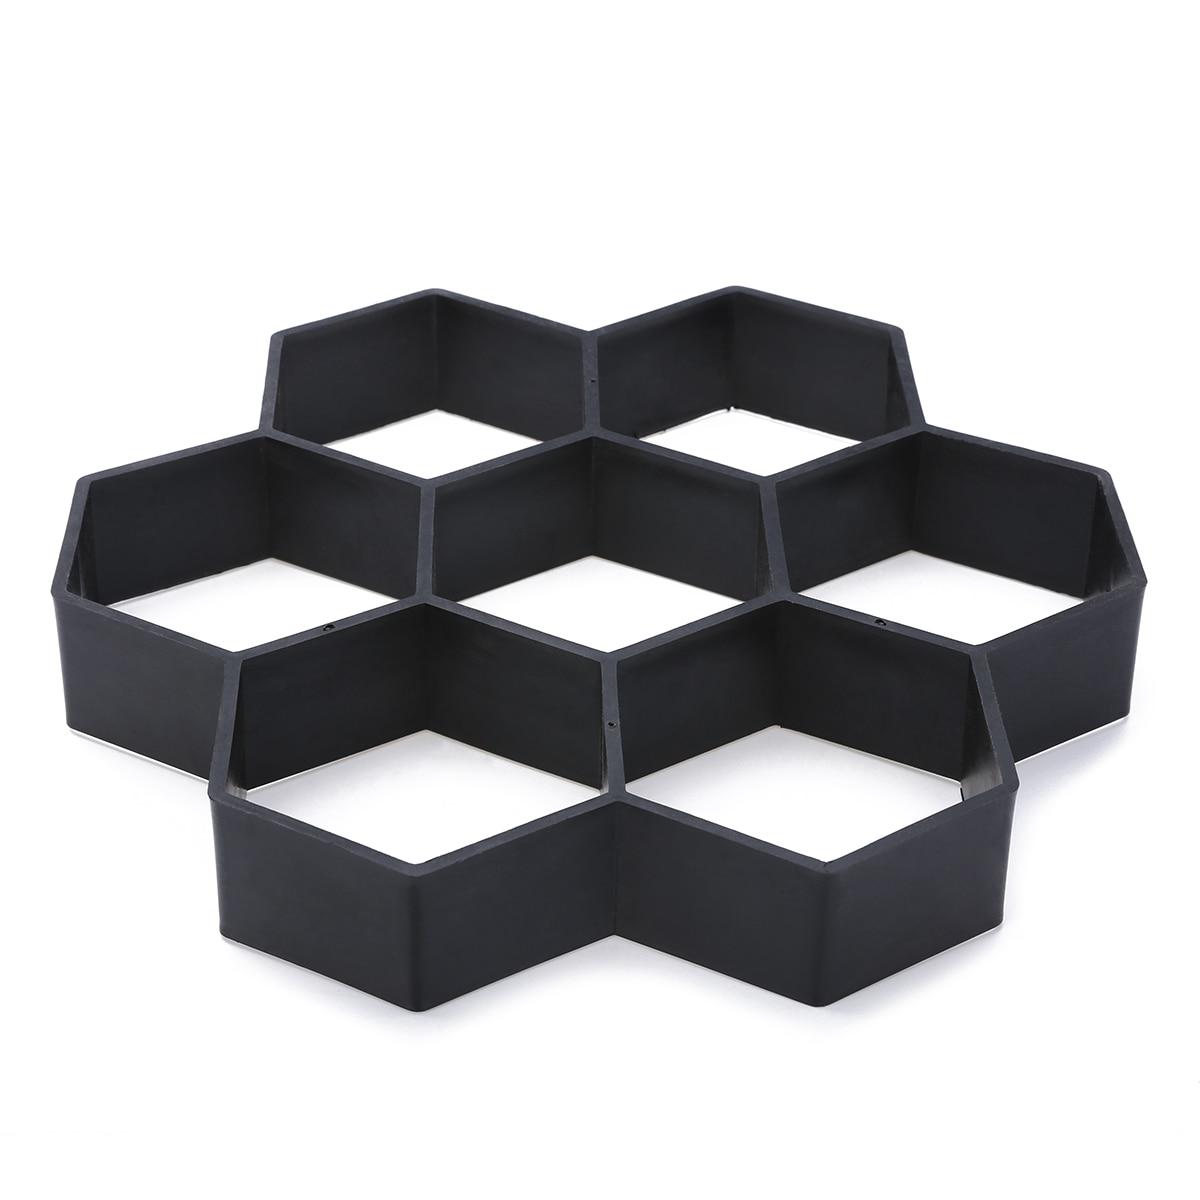 X Cm Einfahrt Pflaster Beton Pathmate Form Stein Form - Betonpflaster 40x40